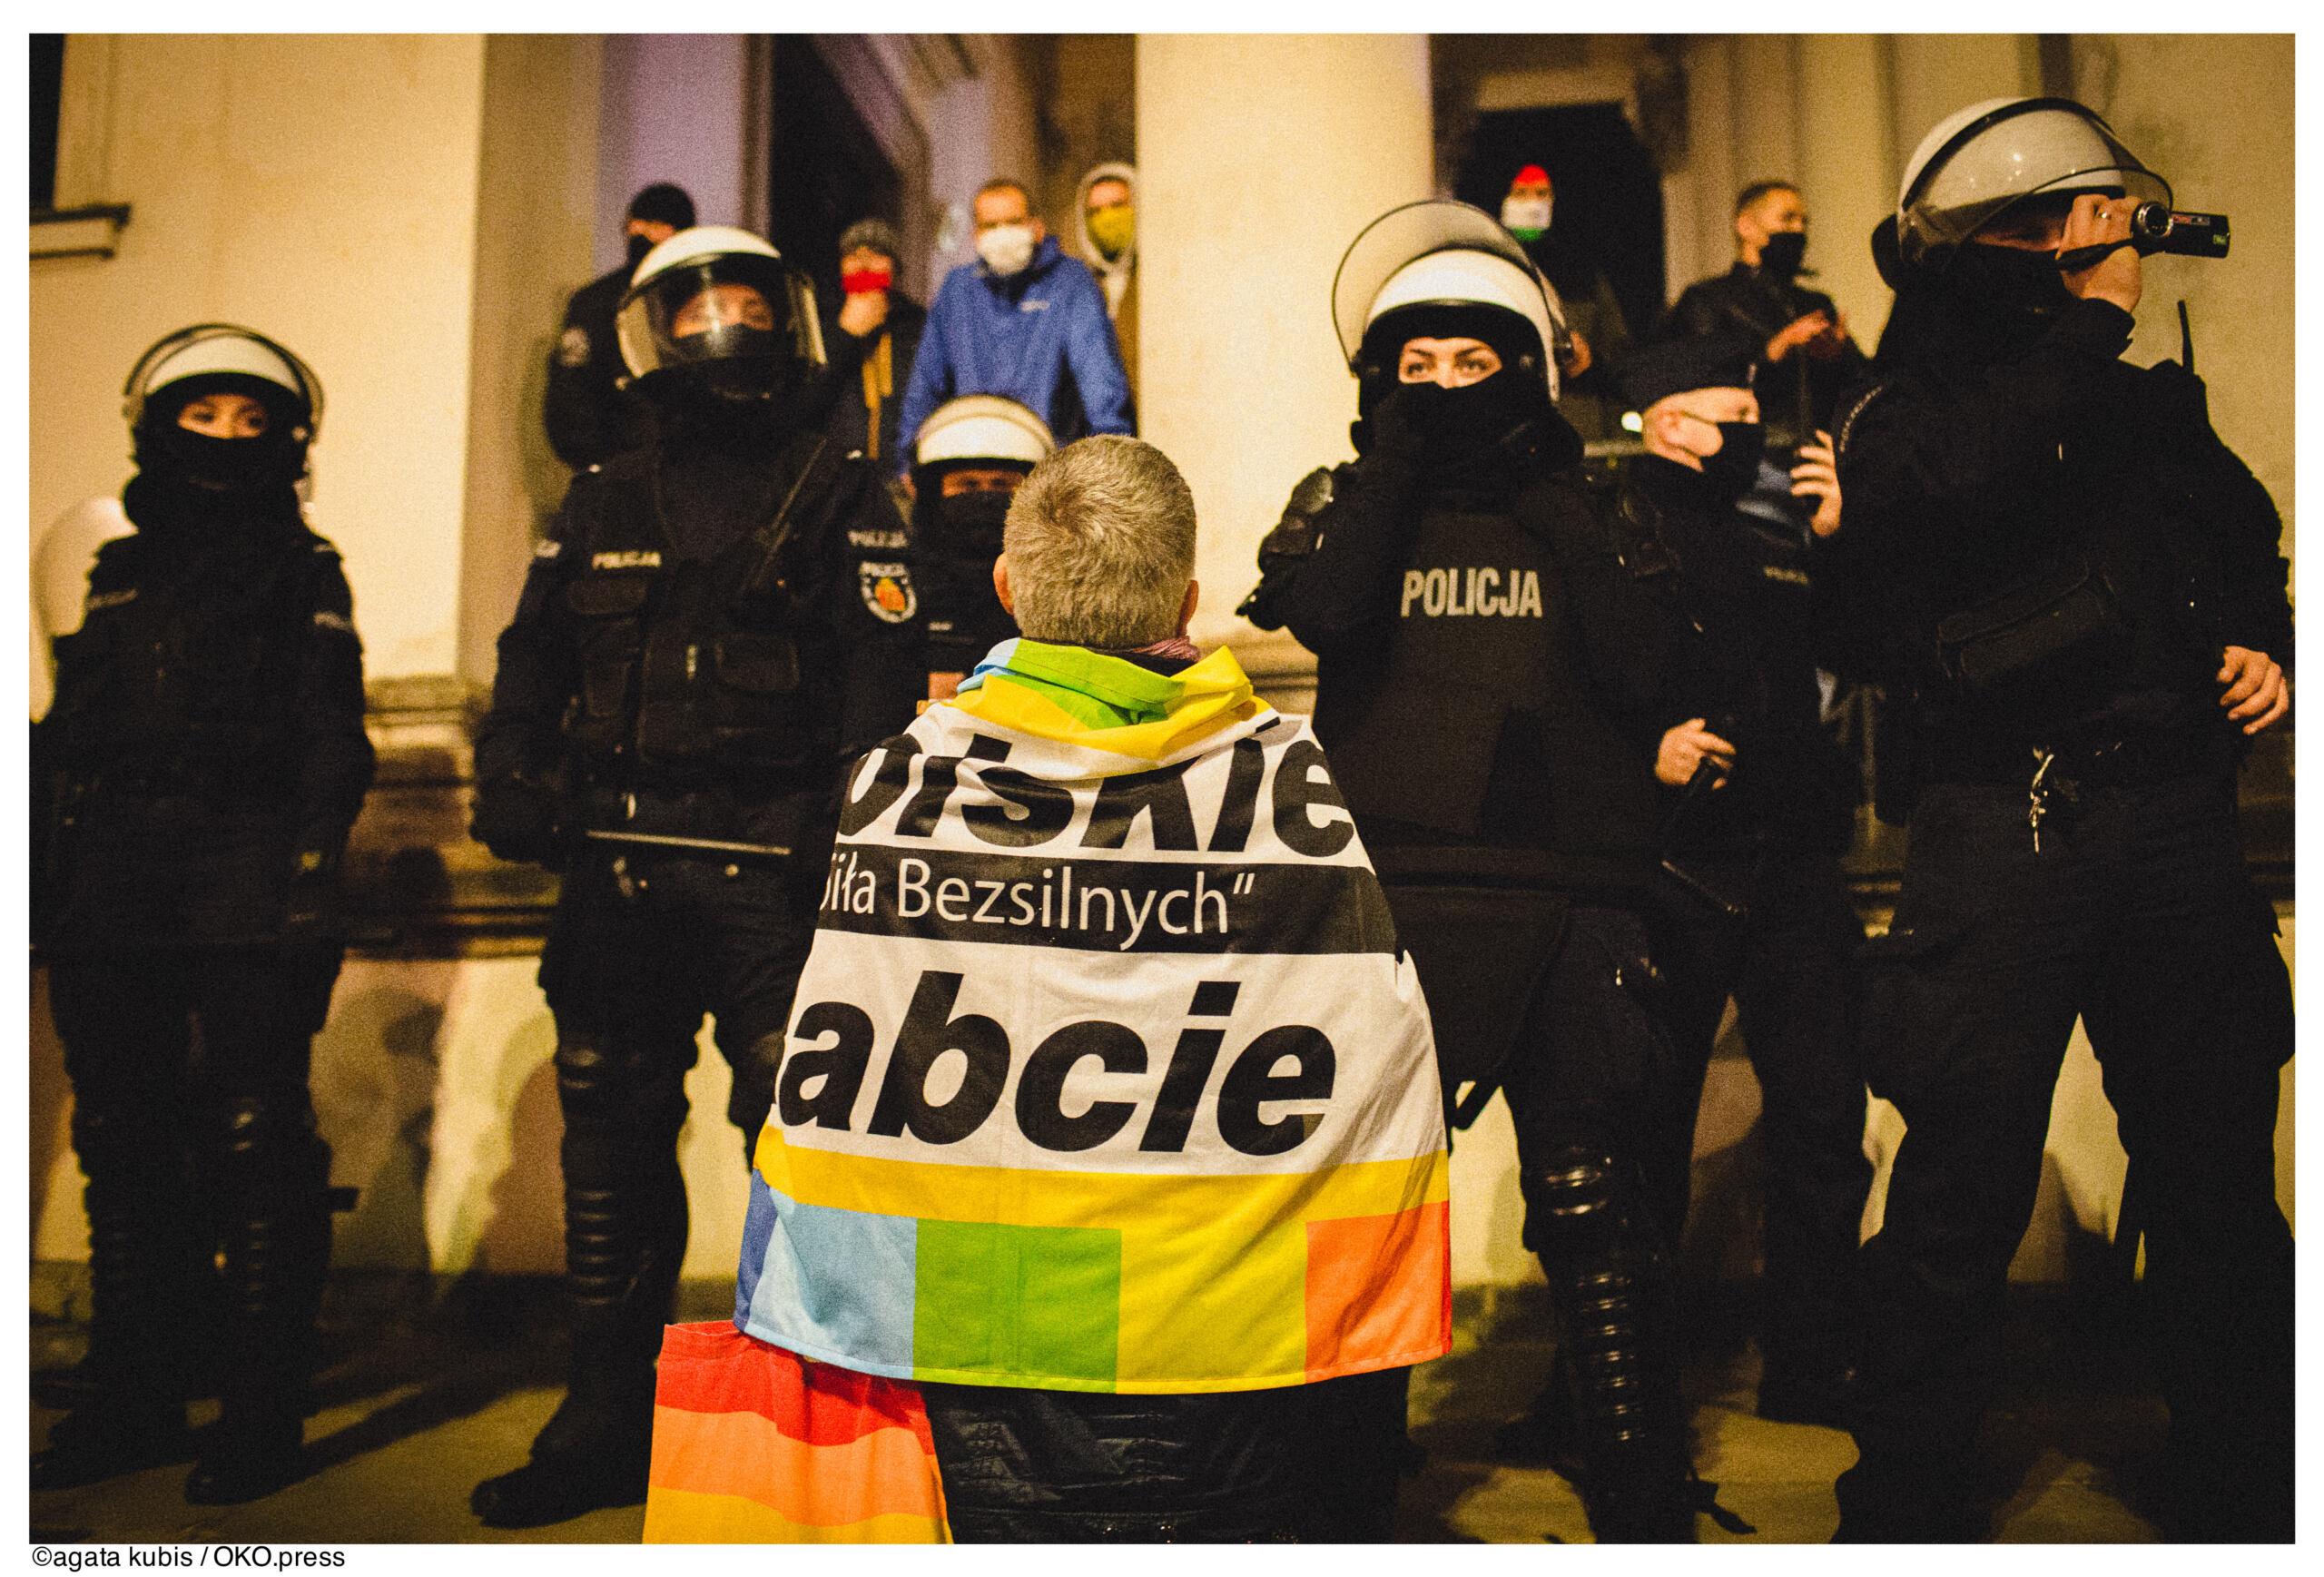 Warszawa, protest 25.10.2020